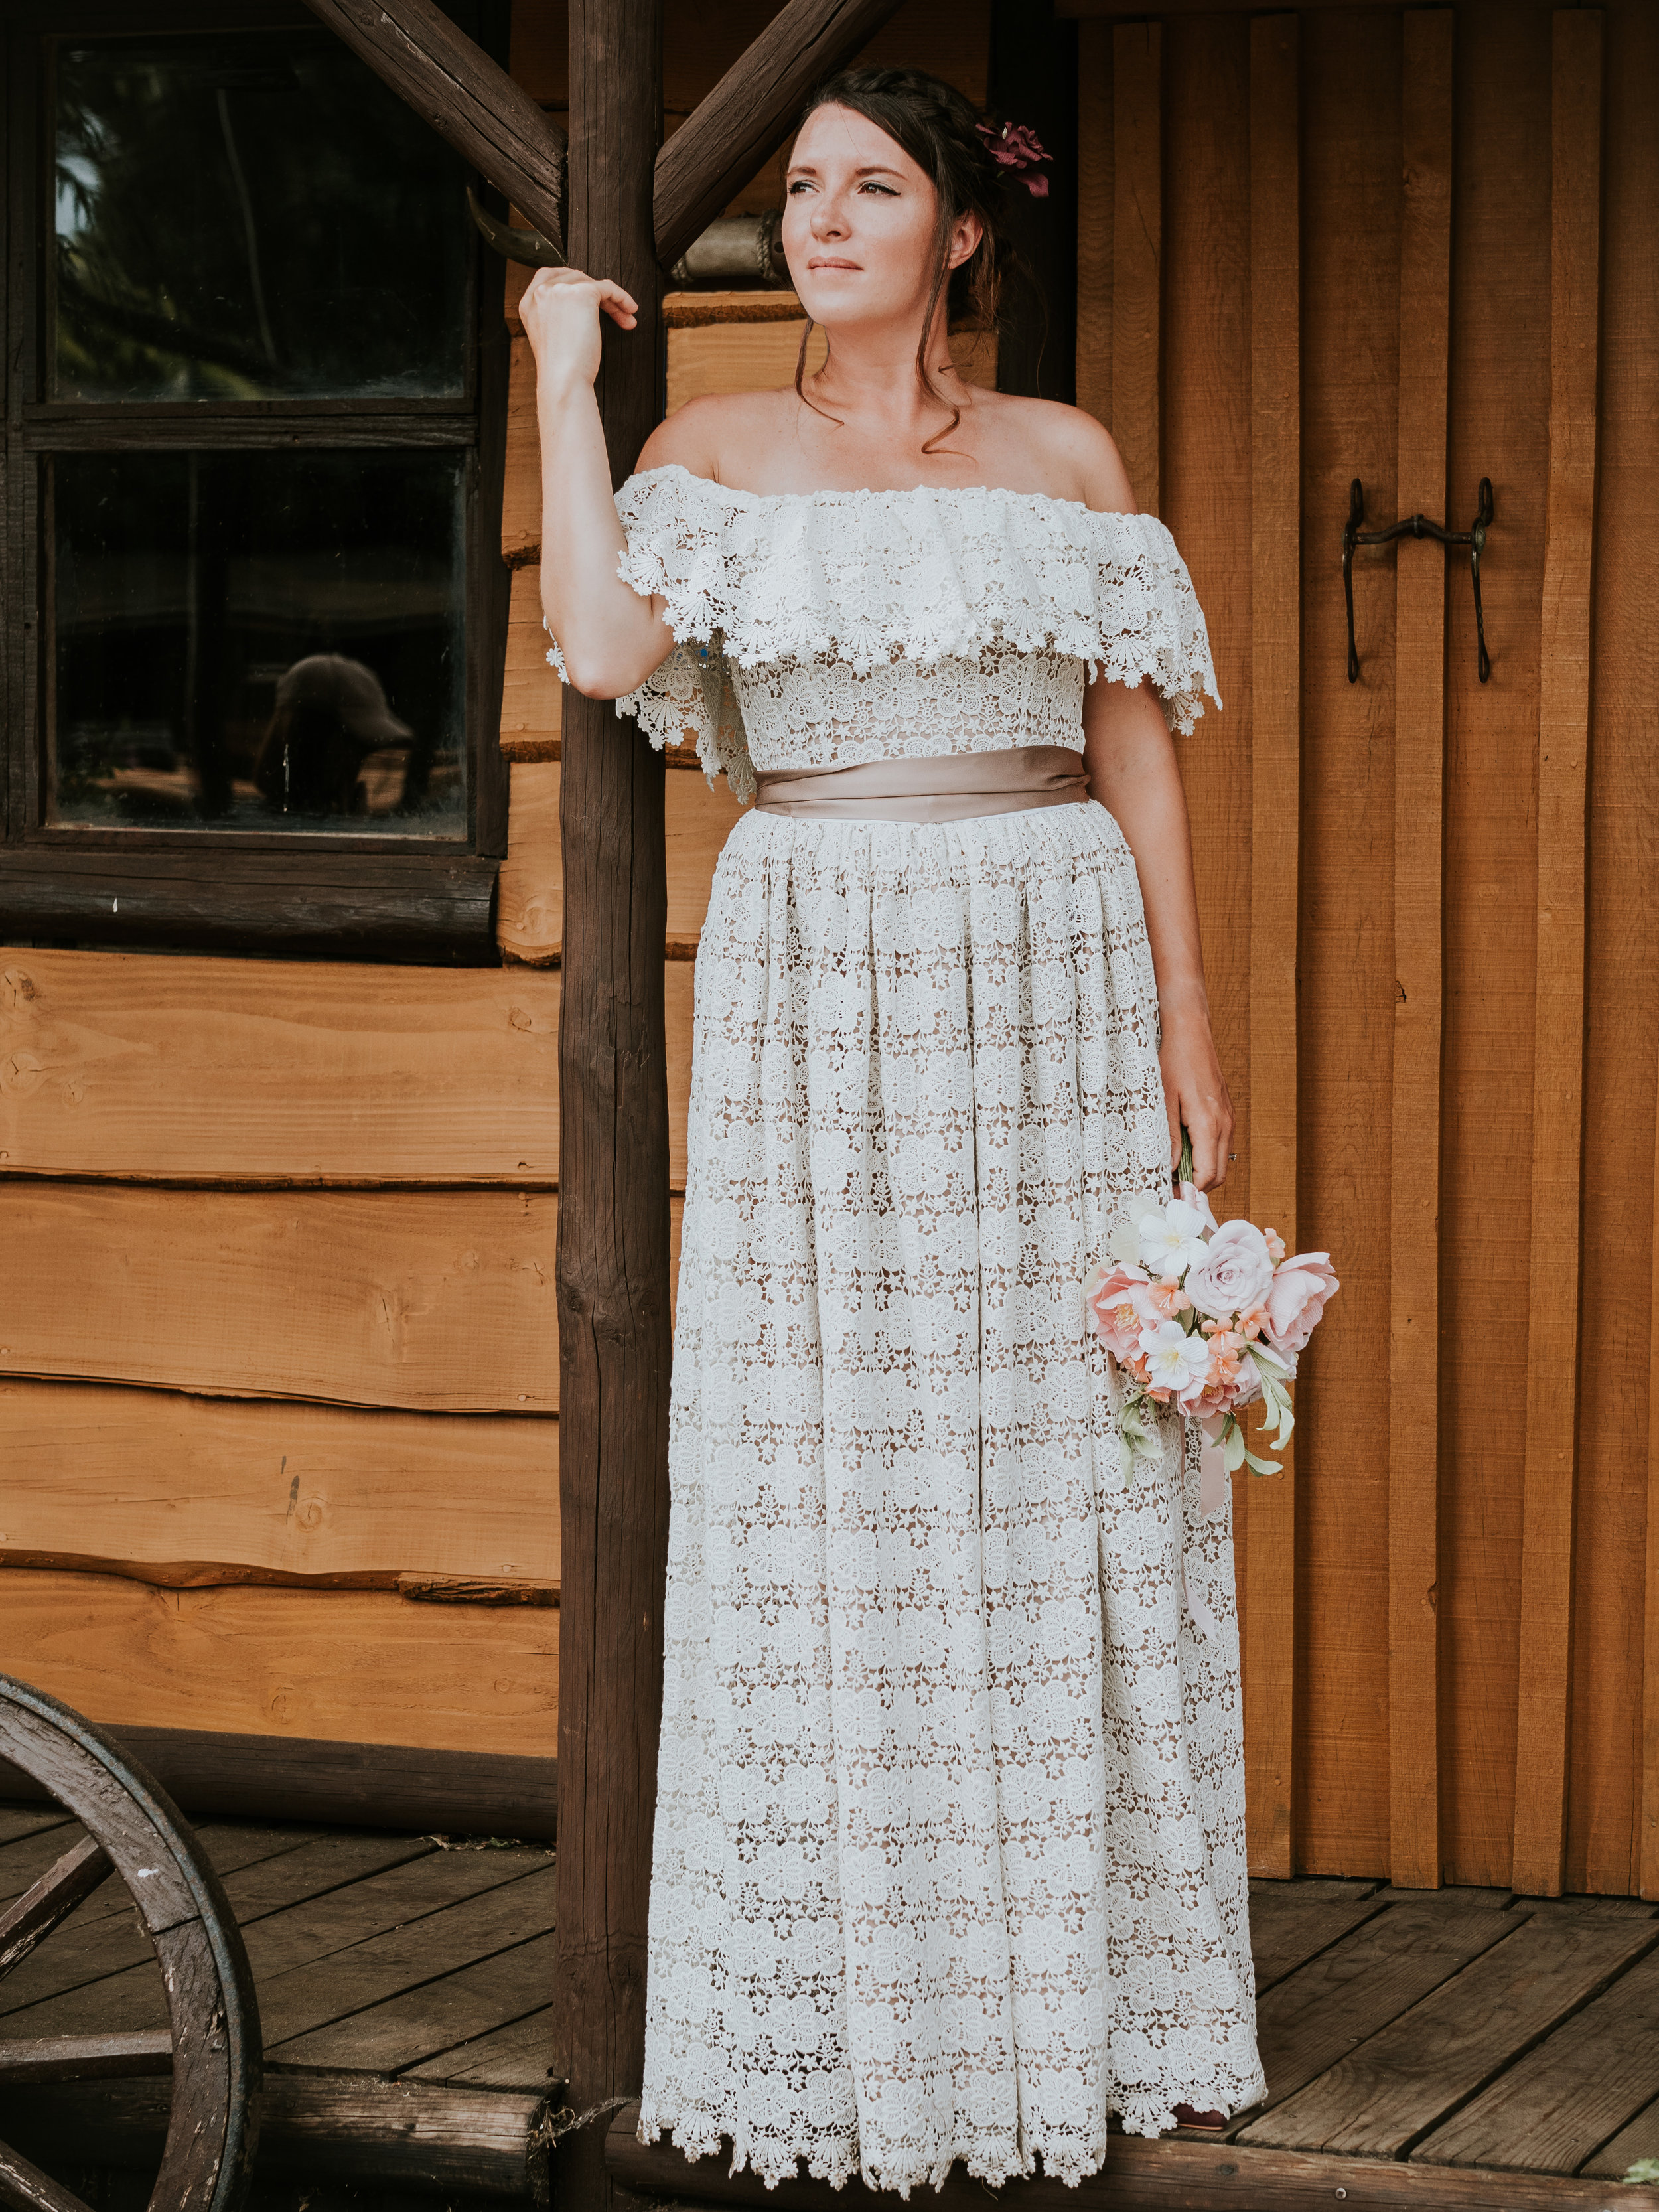 Jessica-Milberg-Photography-Brighton-London-Wedding-Fashion-Photographer-Creative-Wedding-Dress-62.jpg